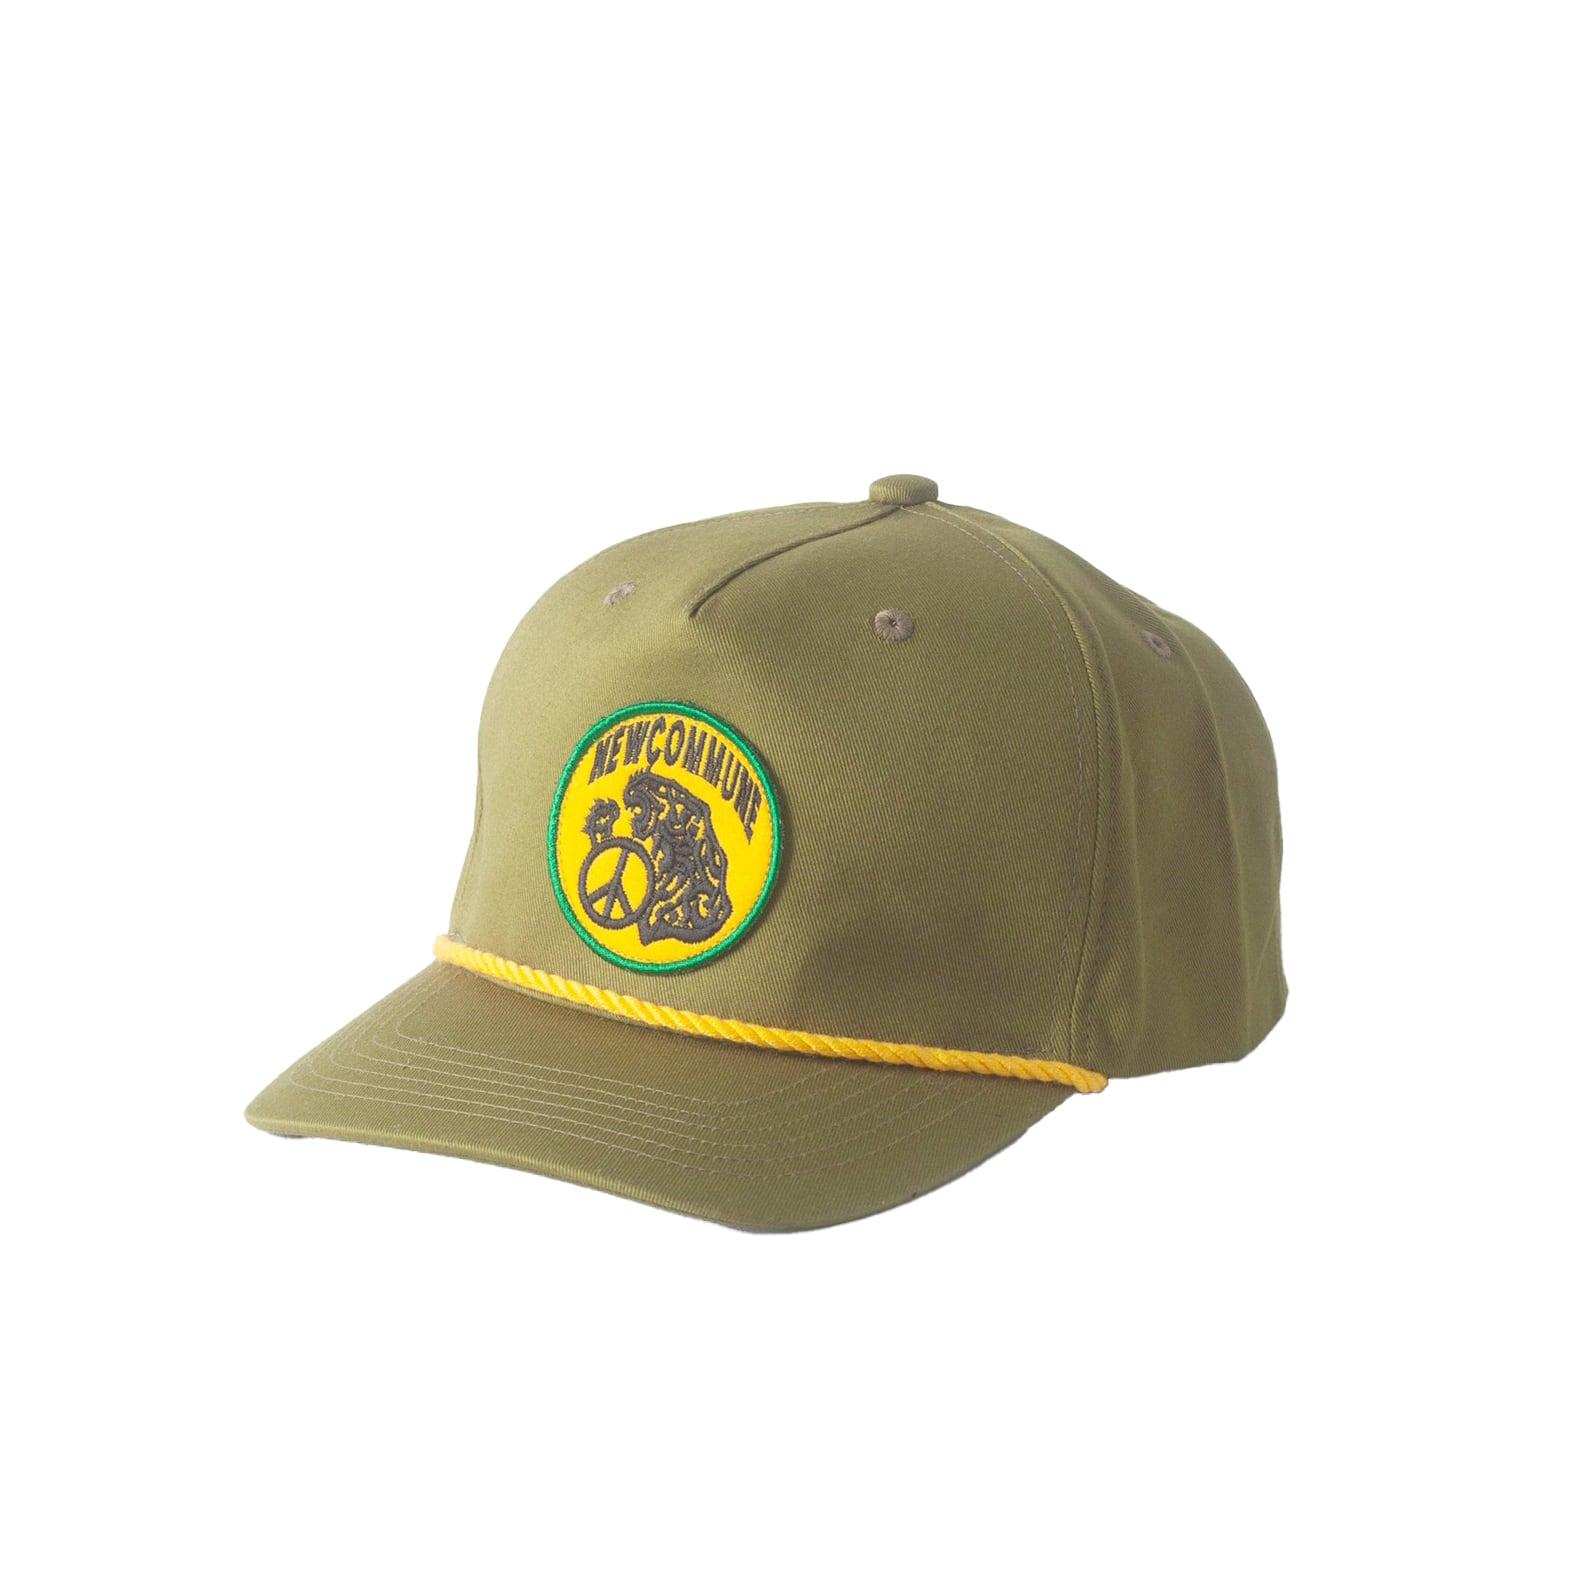 NEW COMMUNE 5 PANEL CAP / GREEN - 画像1